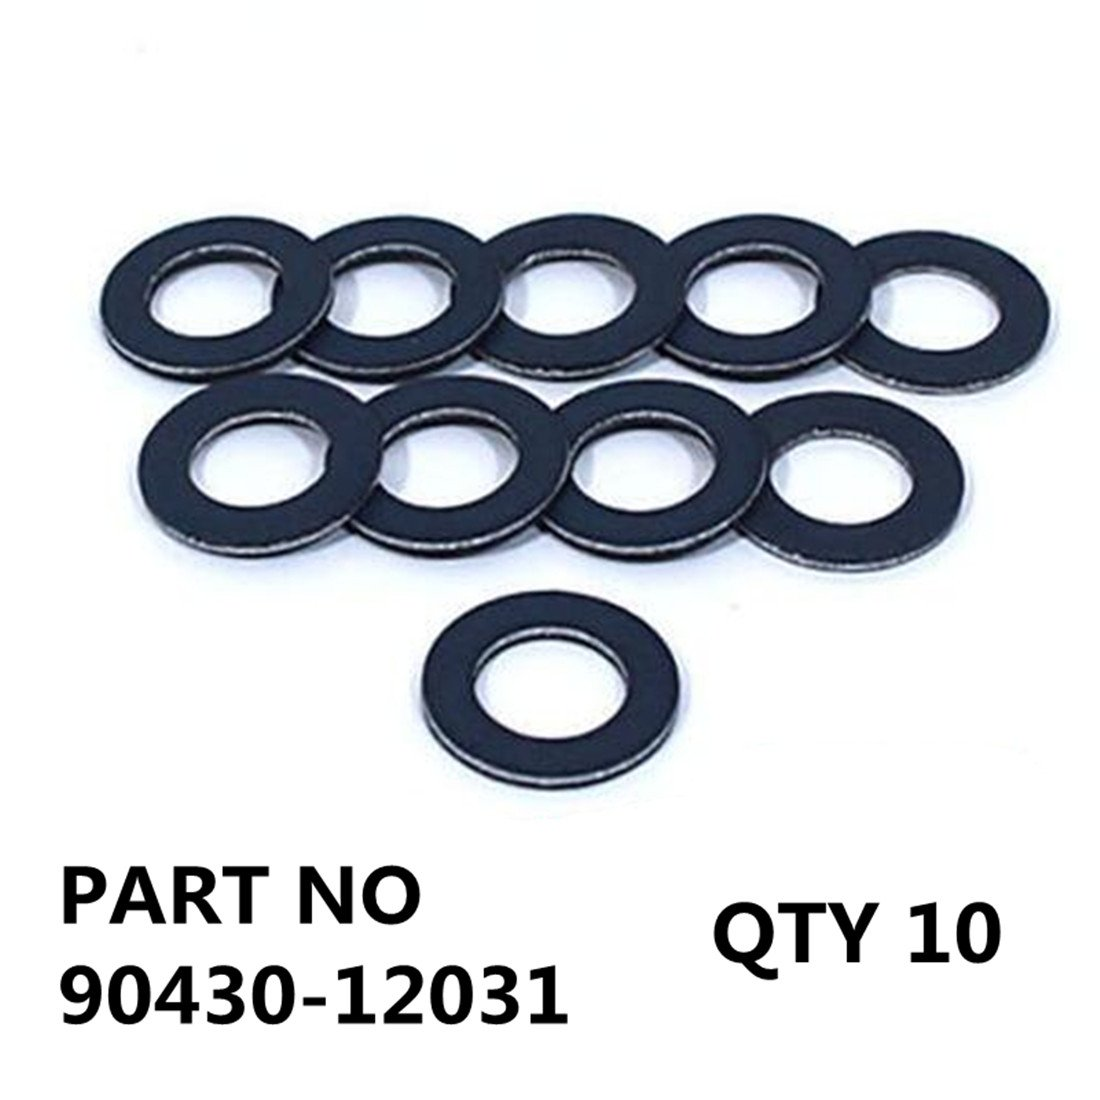 - 90430-12031 Genuine Toyota QTY10 Oil Drain Plug Gaskets